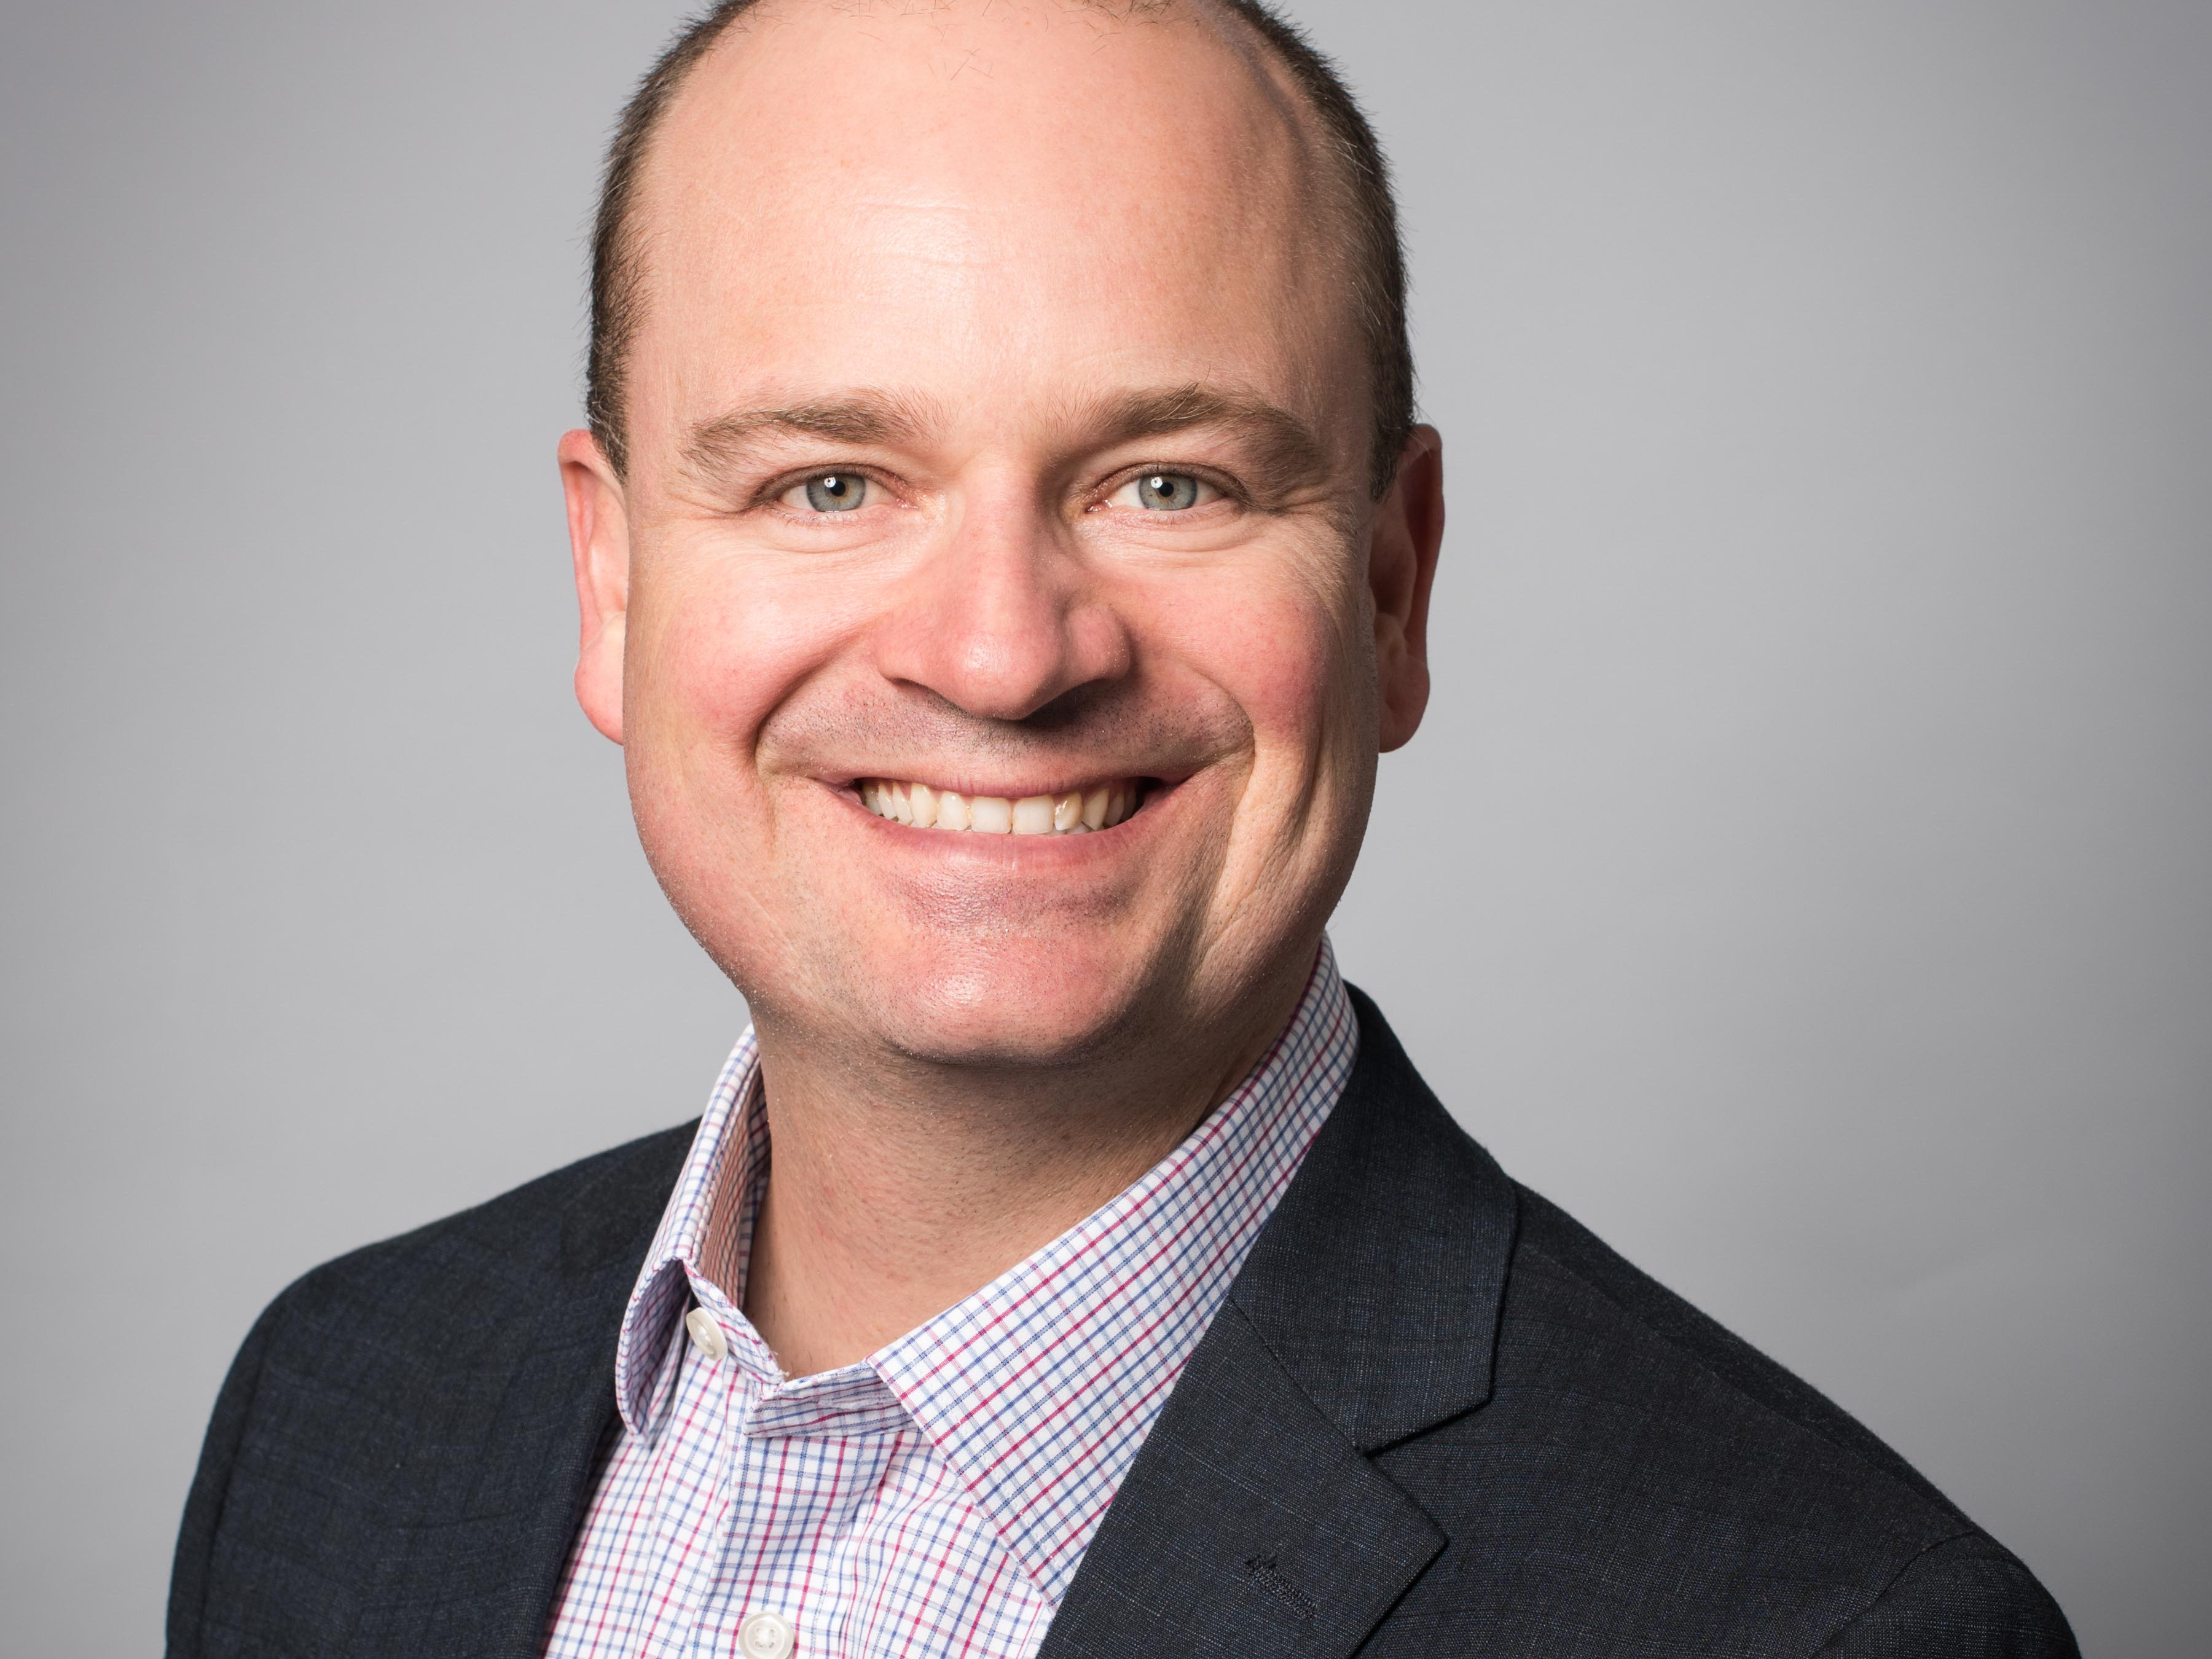 Professor Christopher James Pettit